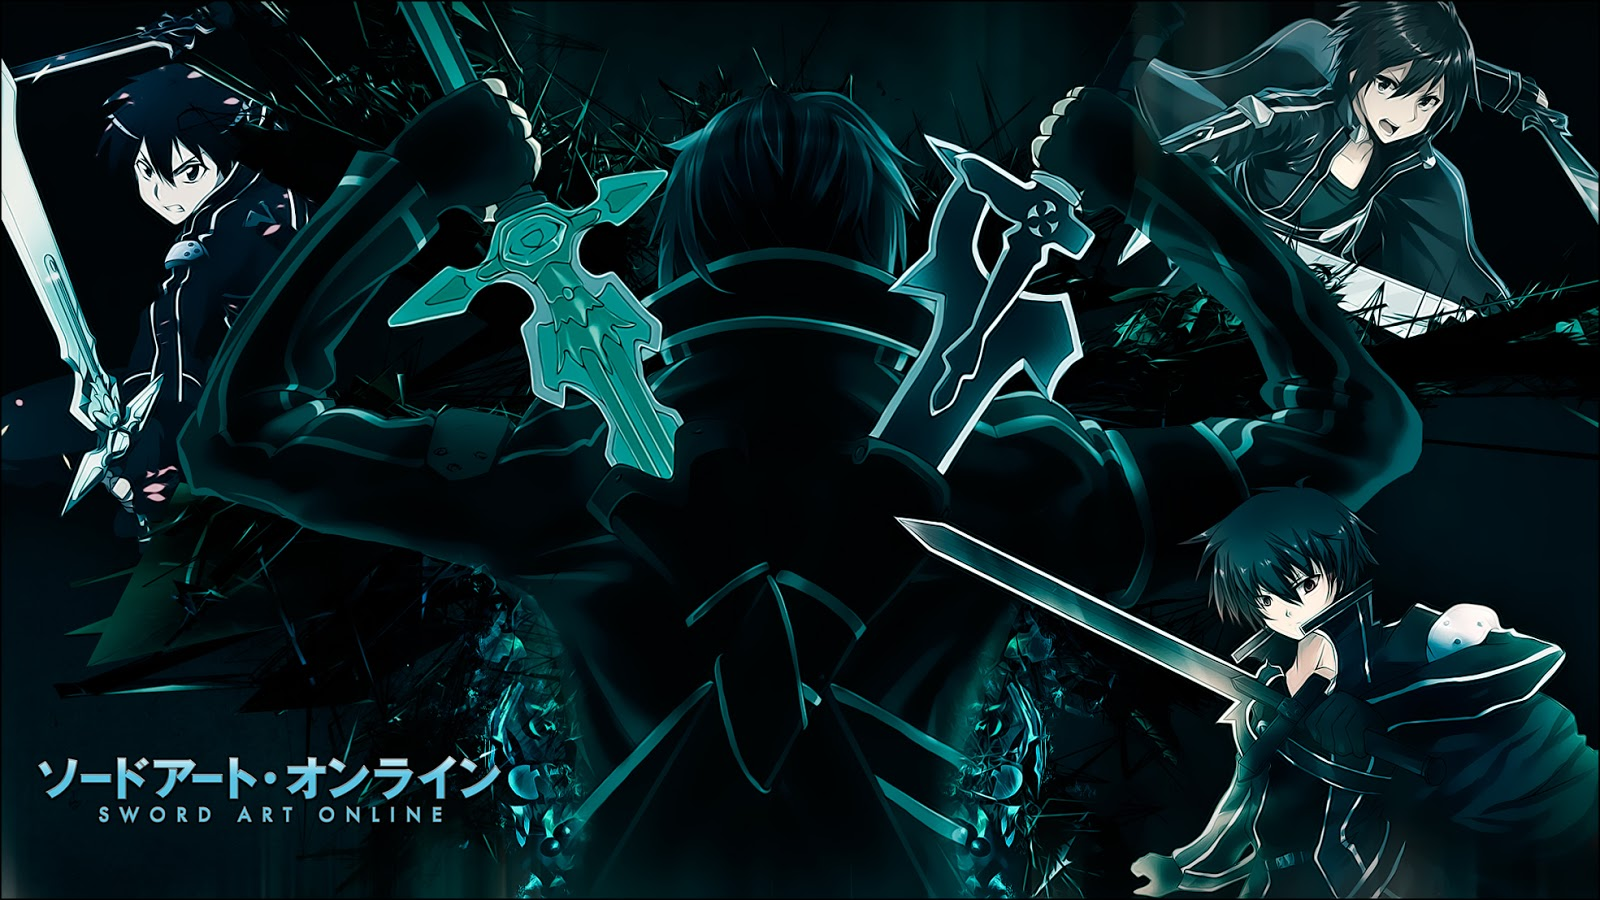 hd wallaper sao sword - photo #16